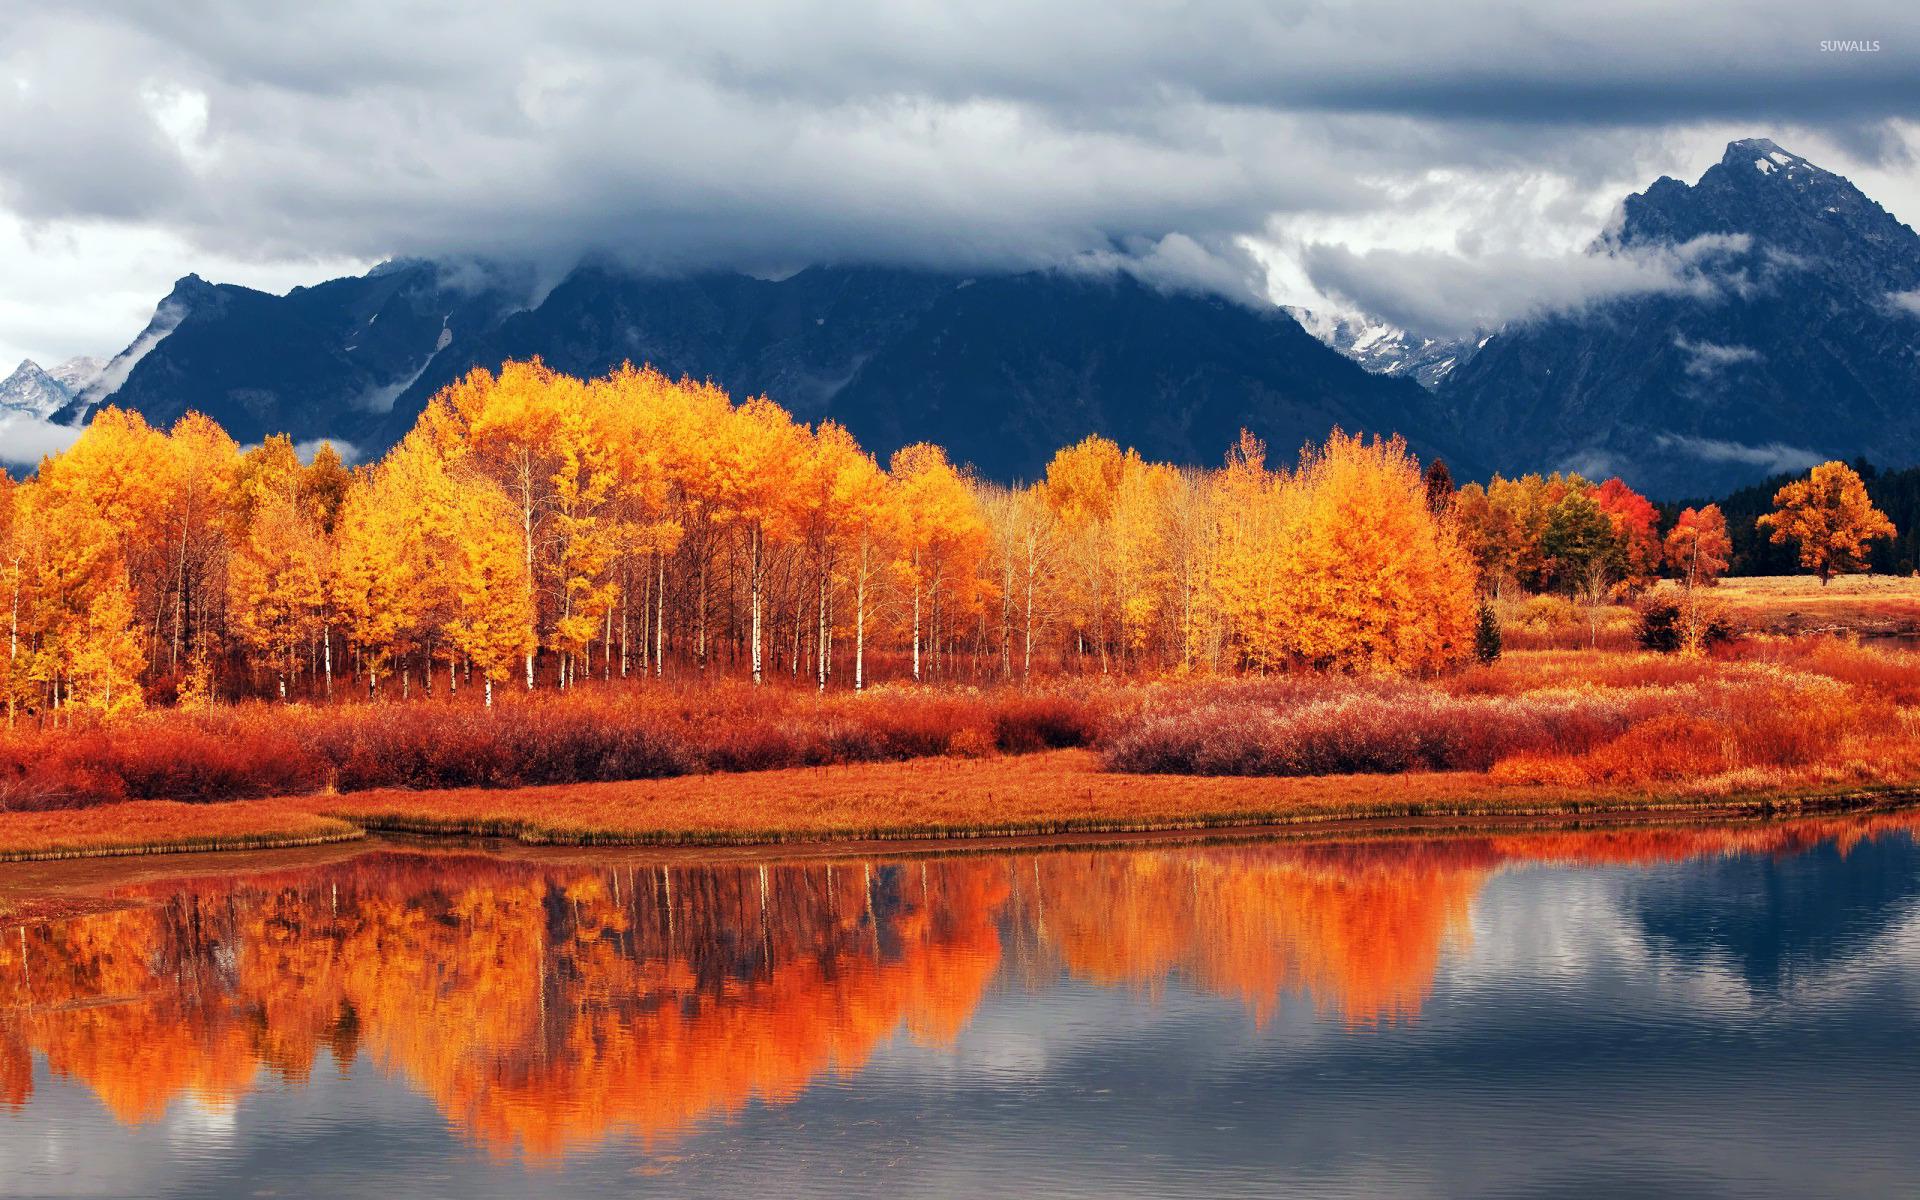 Autumn landscape [2] wallpaper - Nature wallpapers - #15638